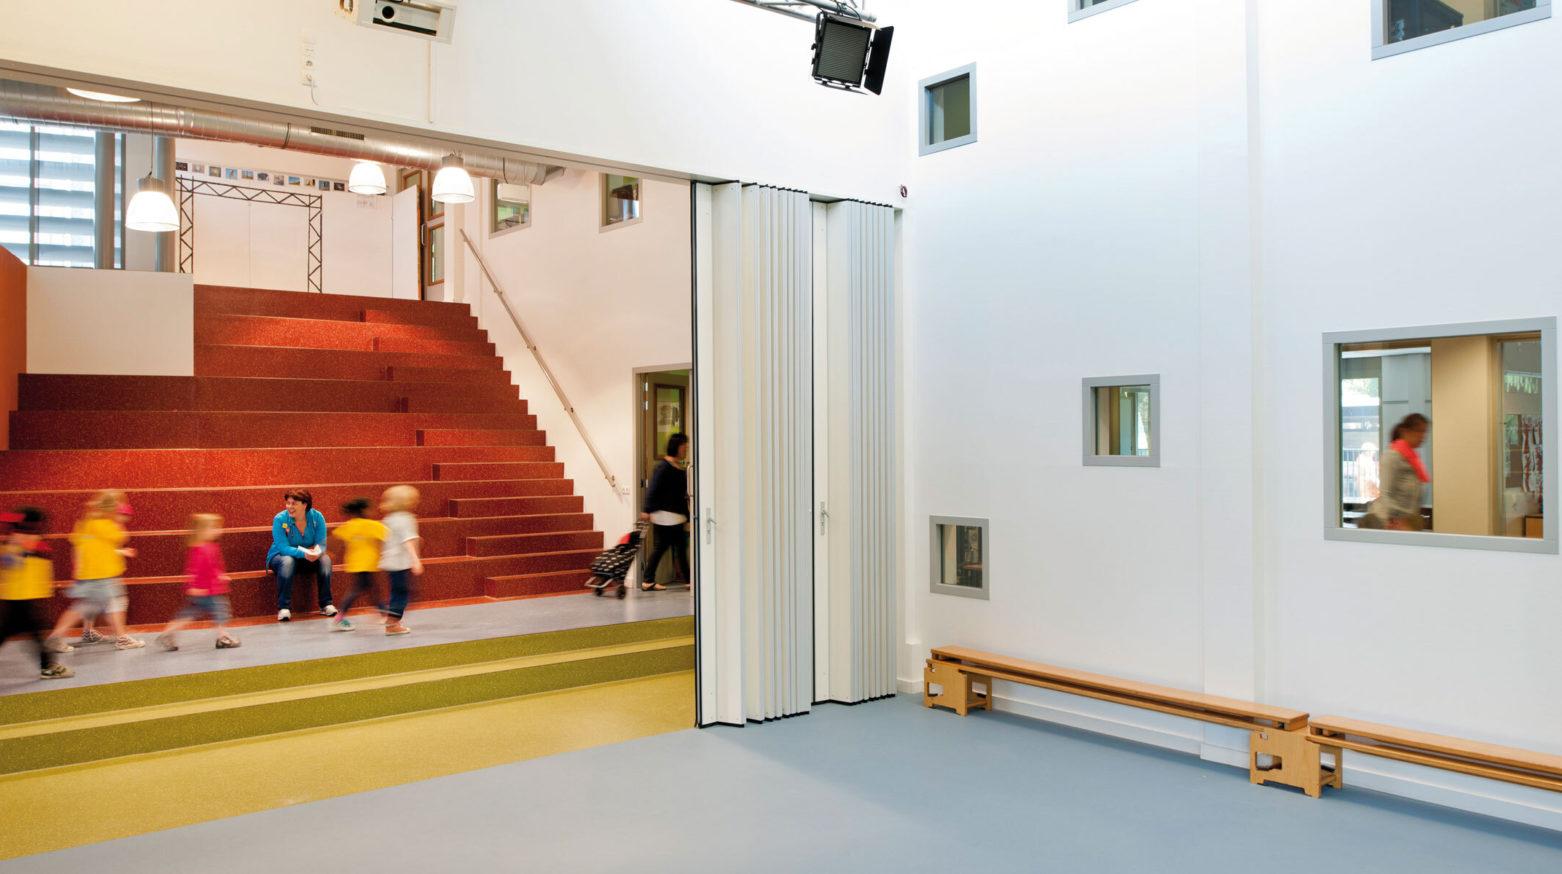 Kindcentrum oirschot 03